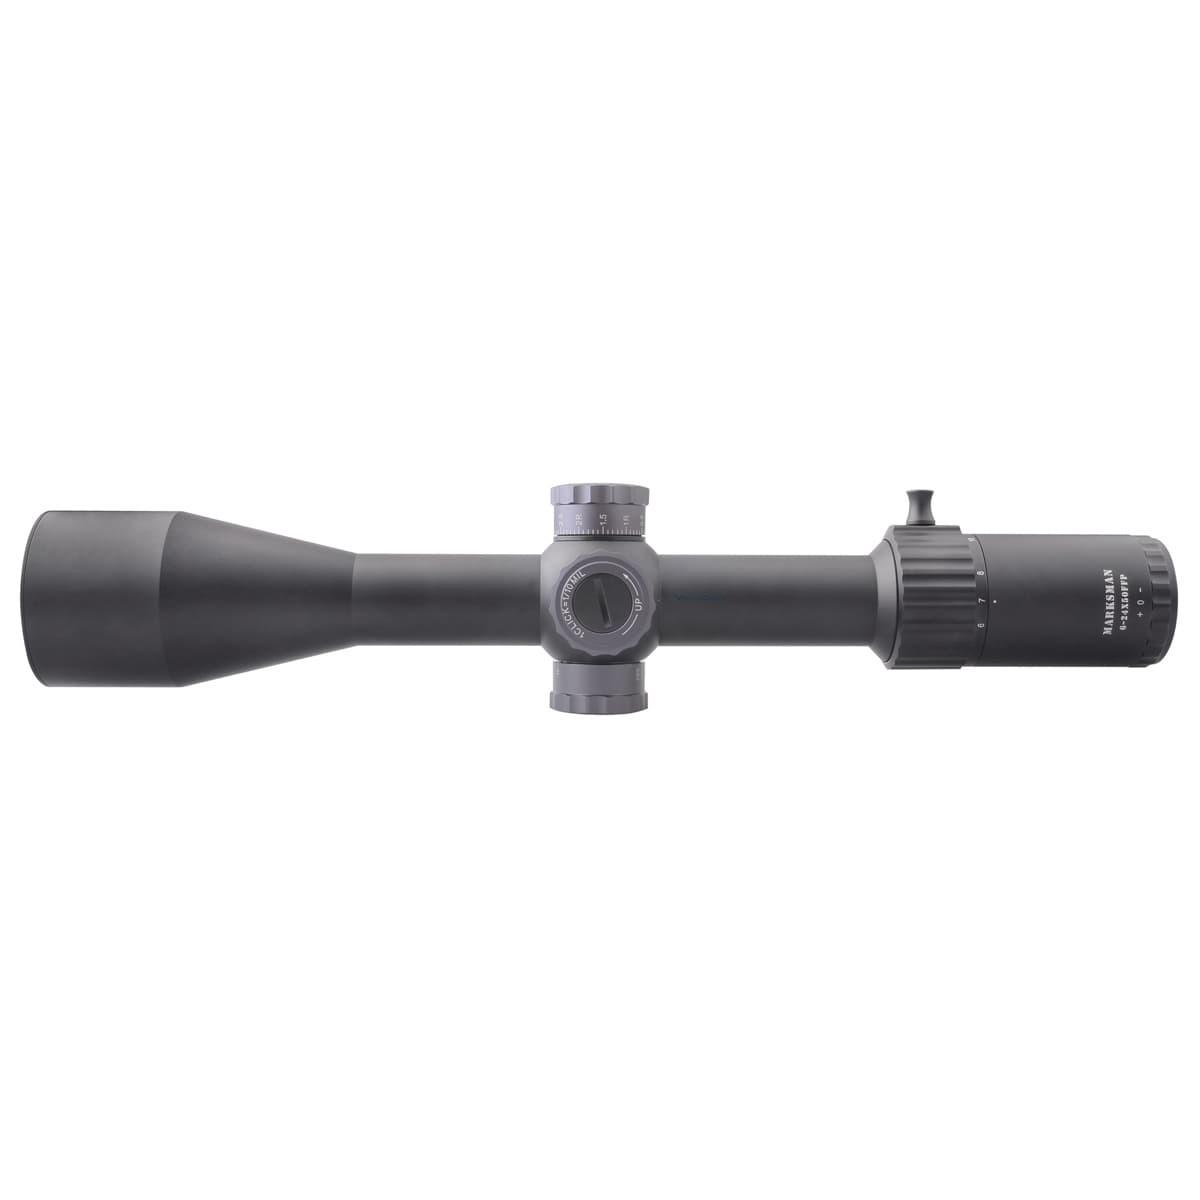 Marksman 6-24x50FFP Riflescope